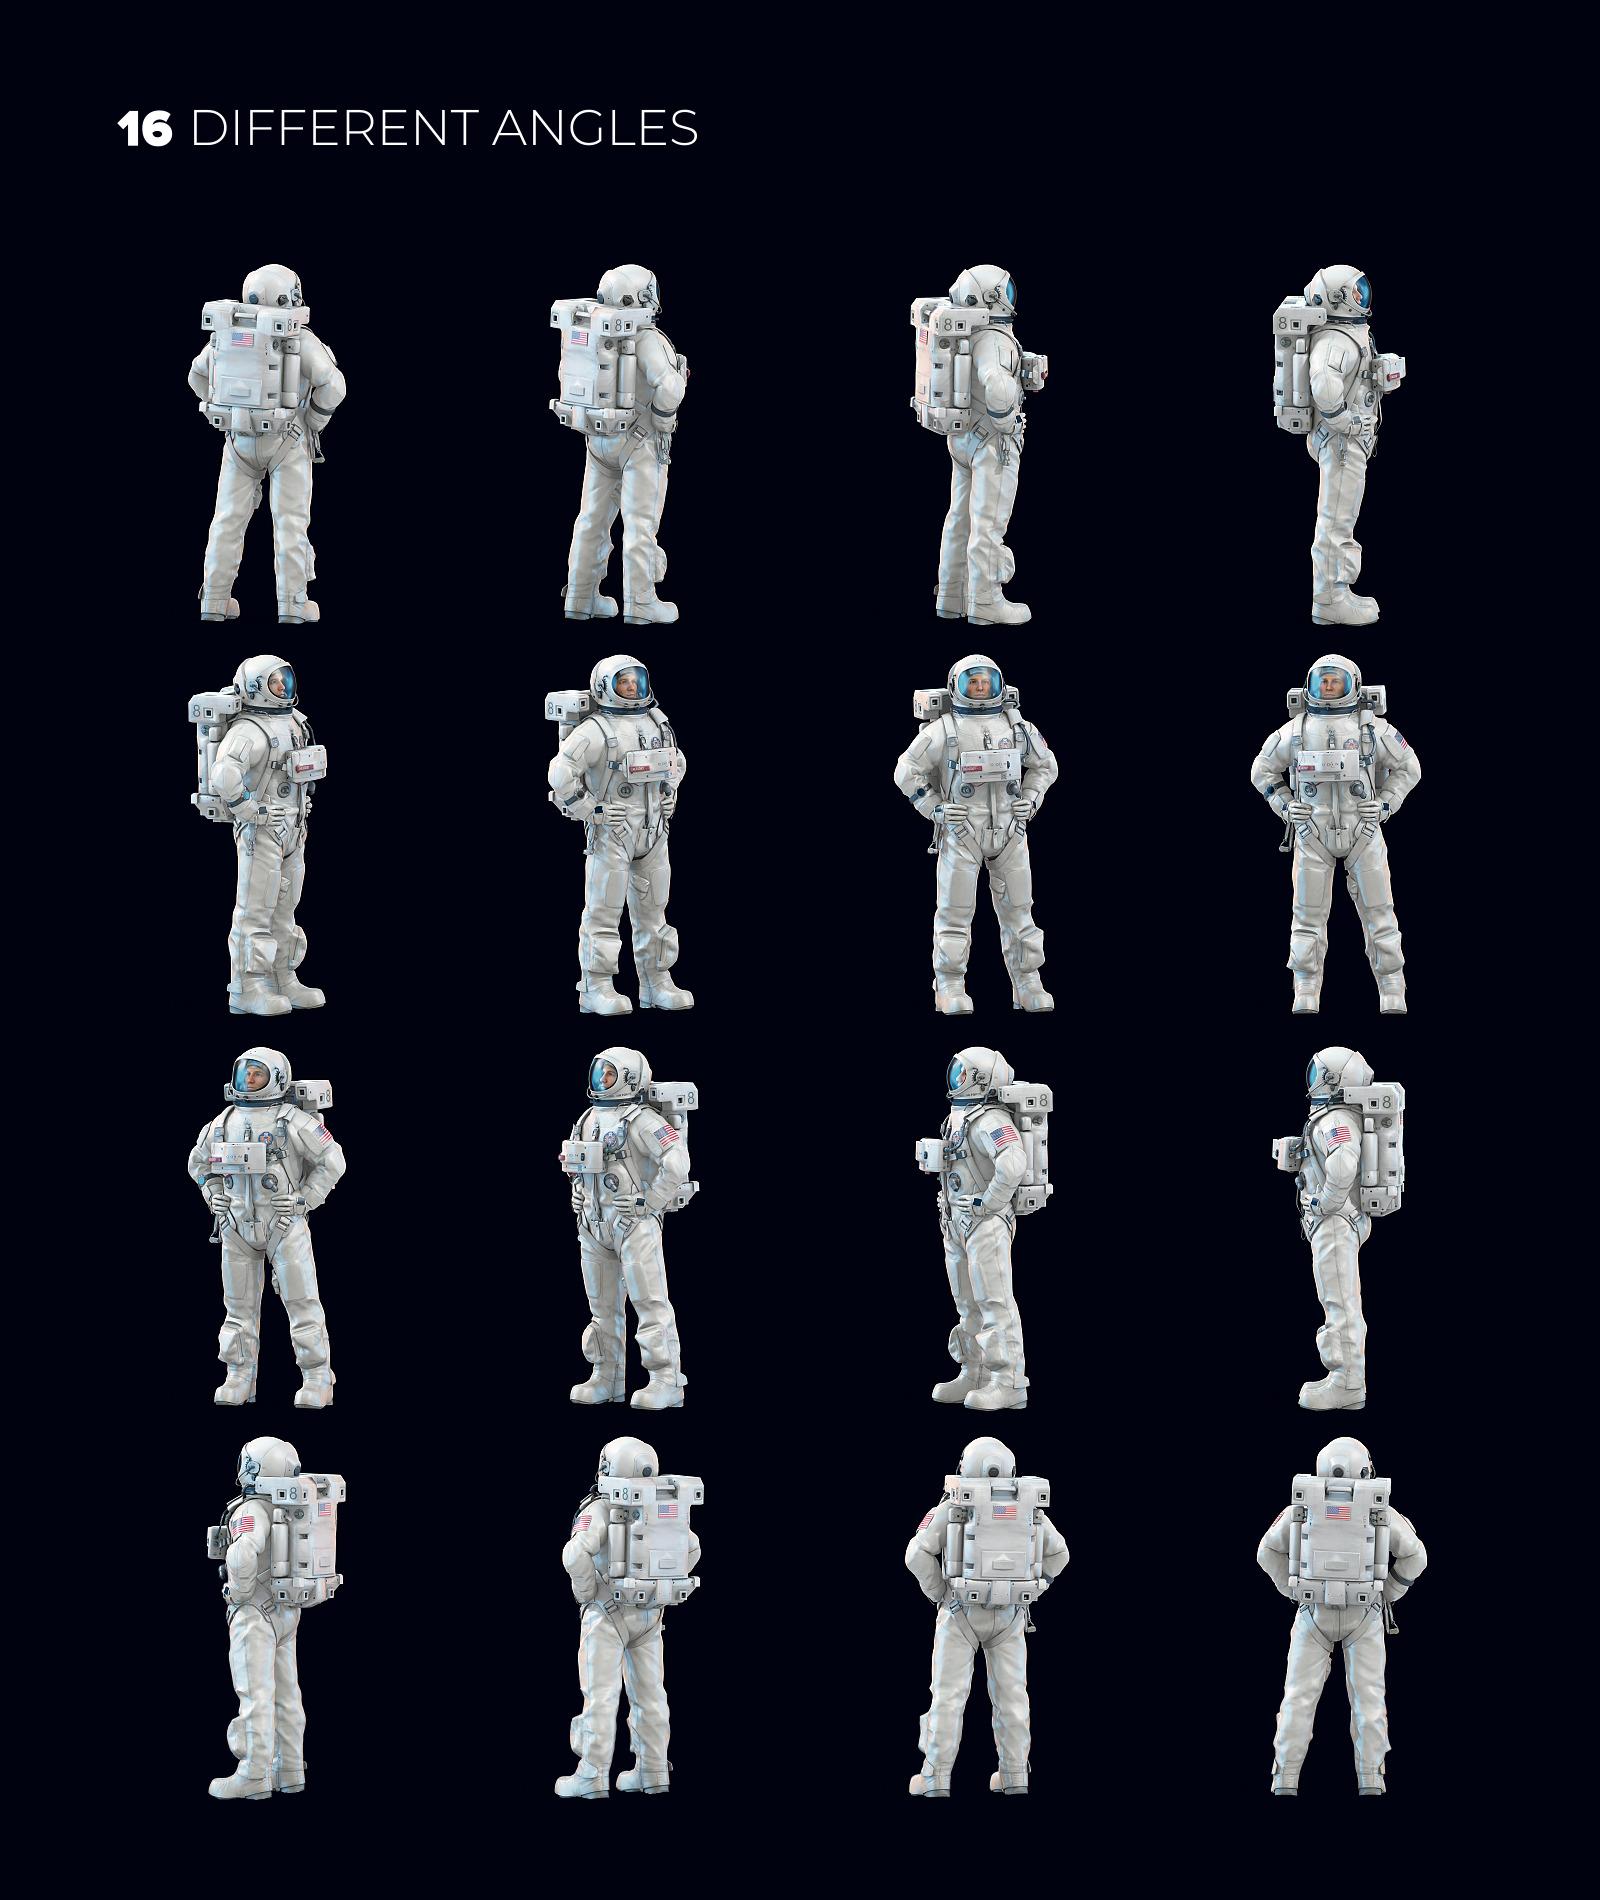 3D Mockup Space Astronaut #18